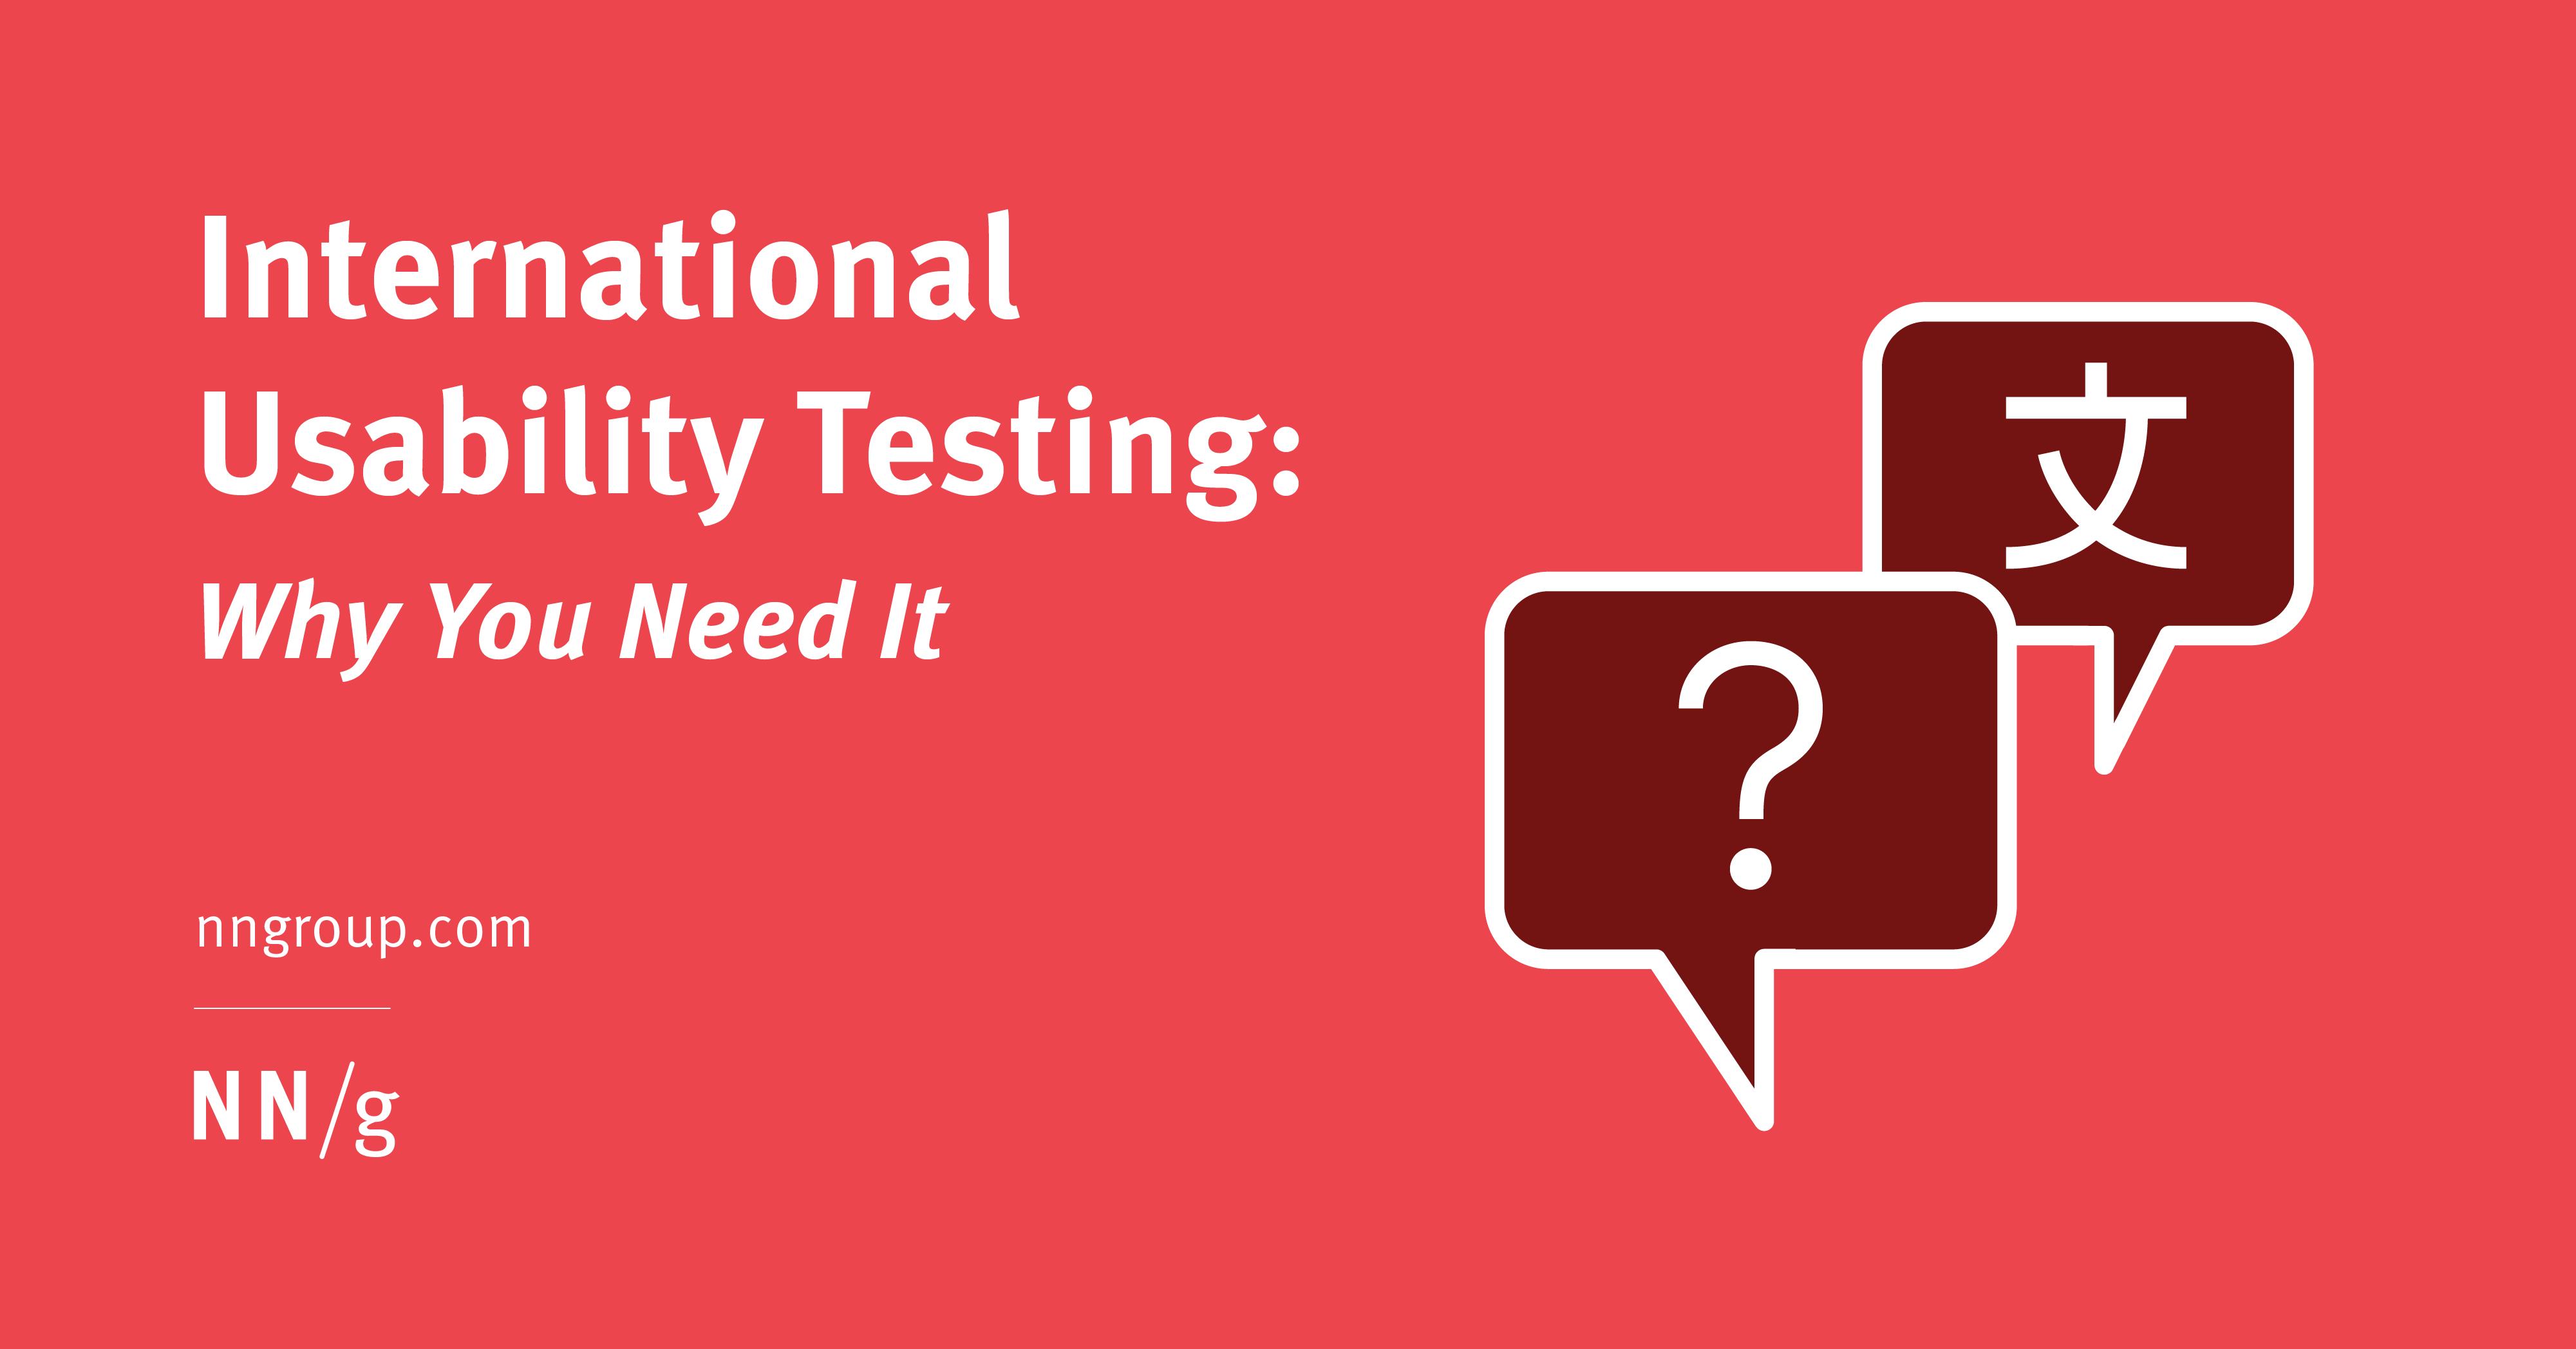 International Usability Testing: Why You Need It